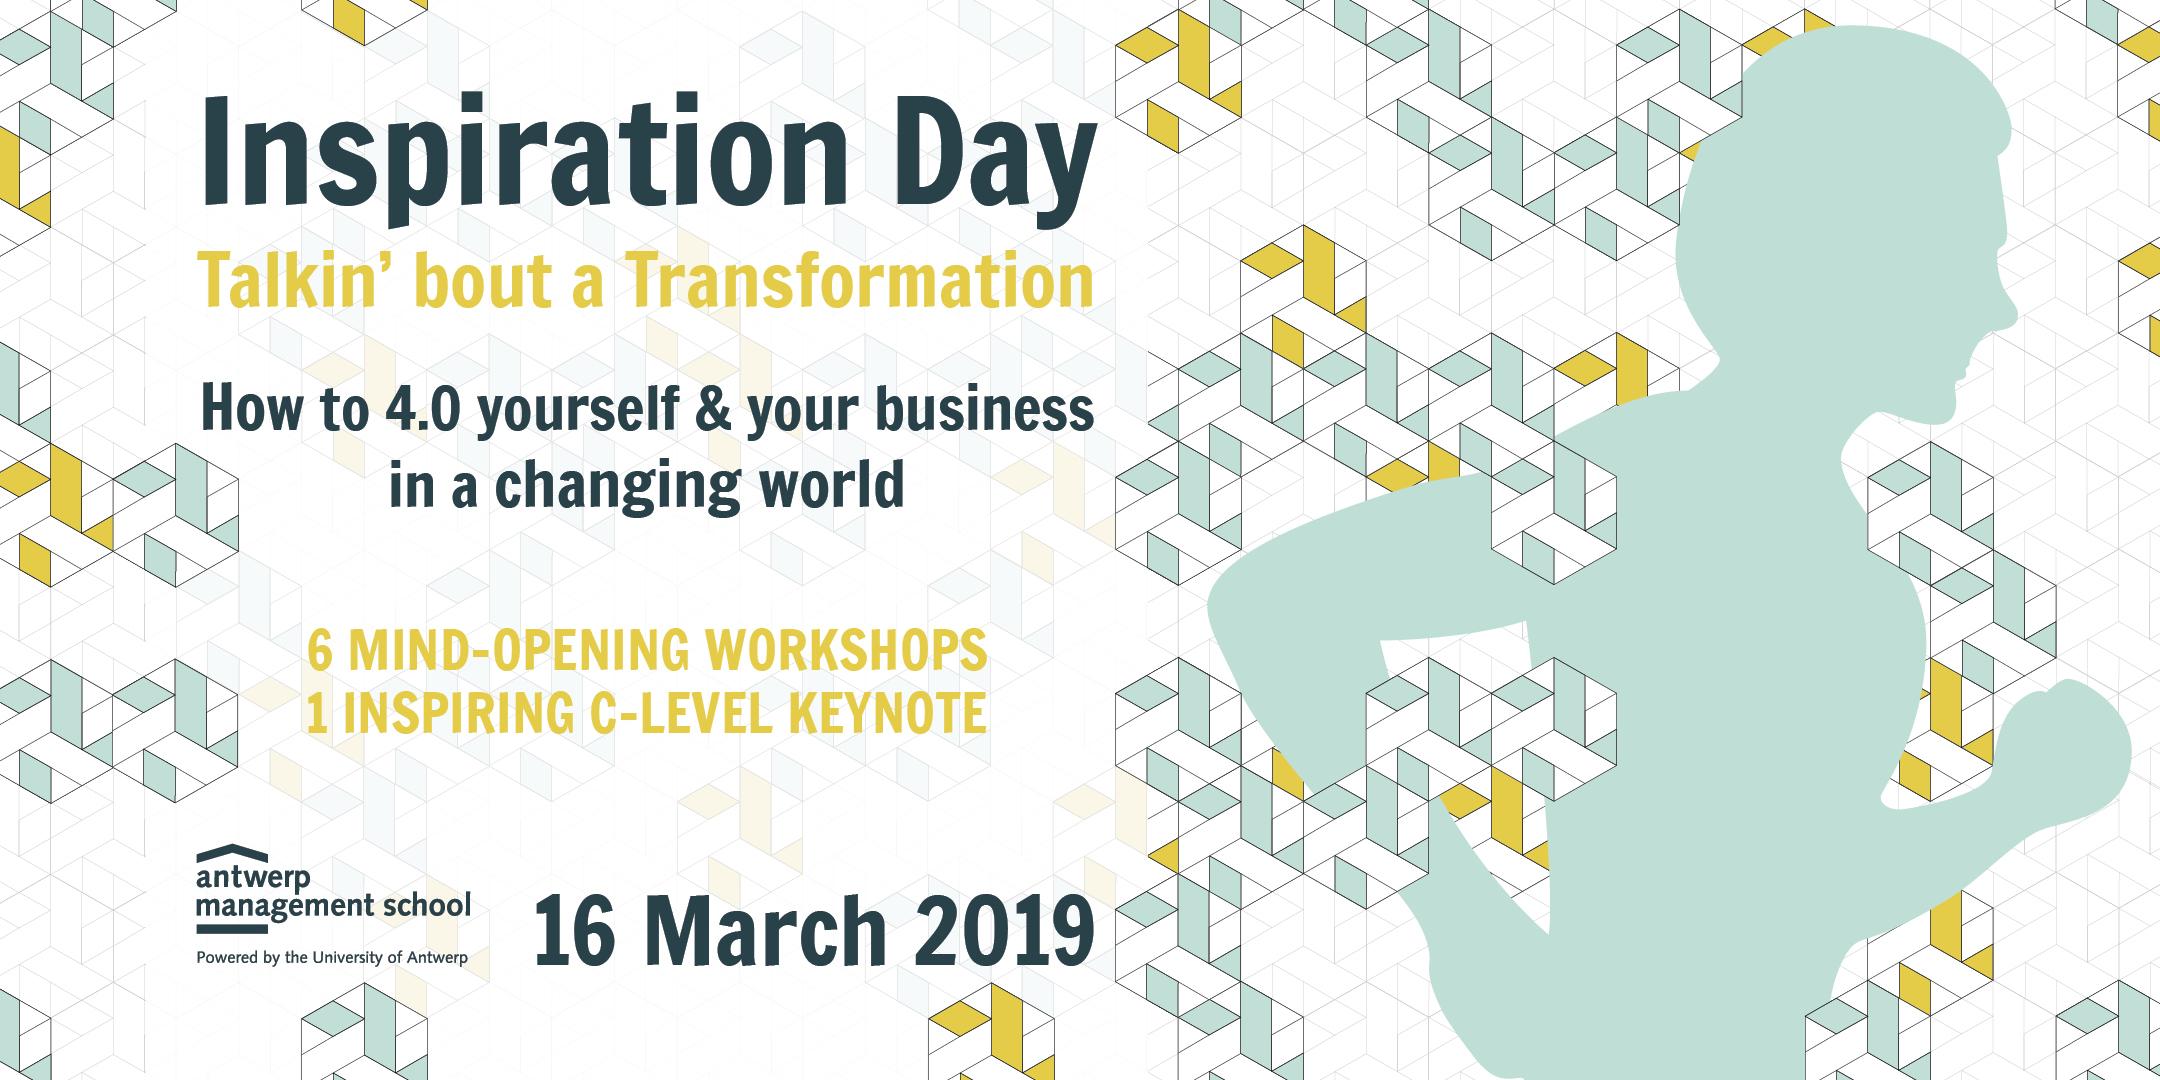 Inspiration day 2019